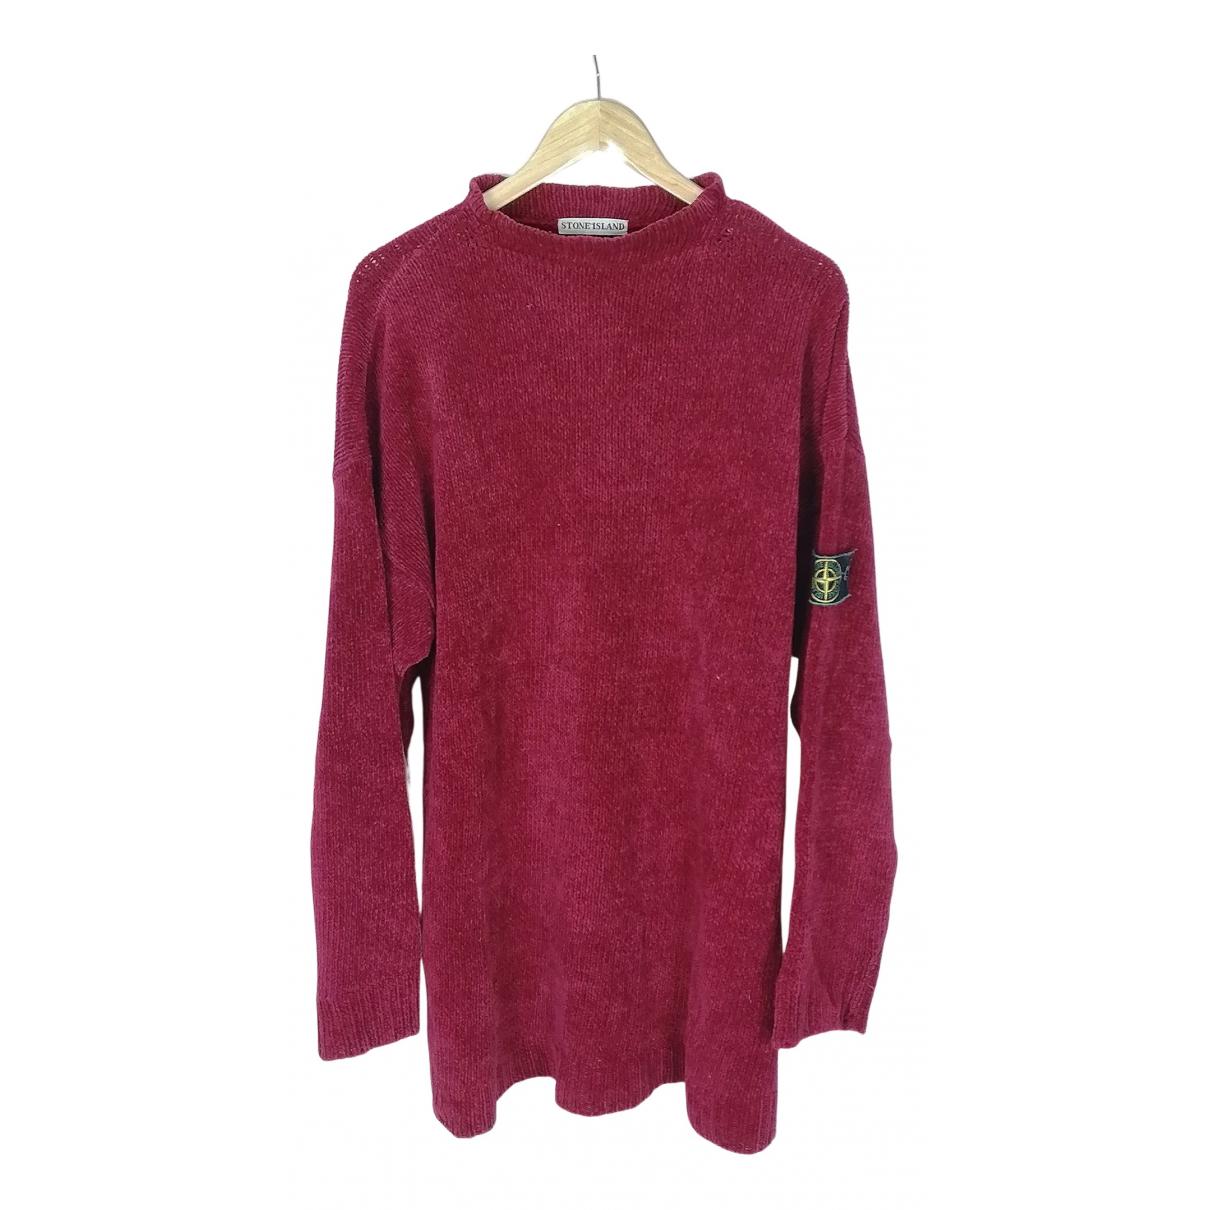 Stone Island N Red Cotton Knitwear & Sweatshirts for Men XL International